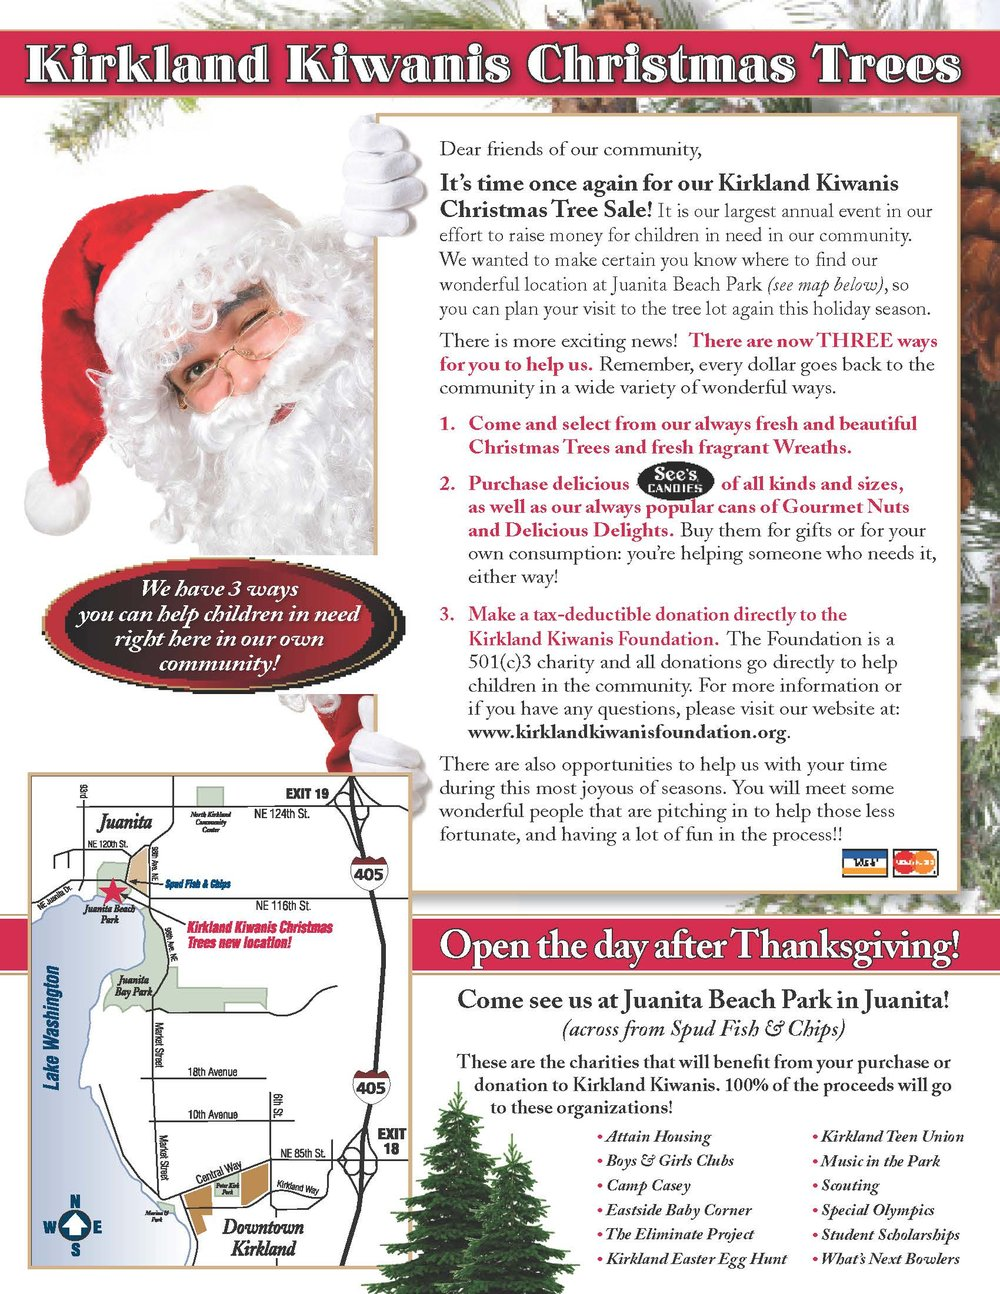 Kiwanis Club Of Kirkland Christmas Tree Lot Opens November 25 ...